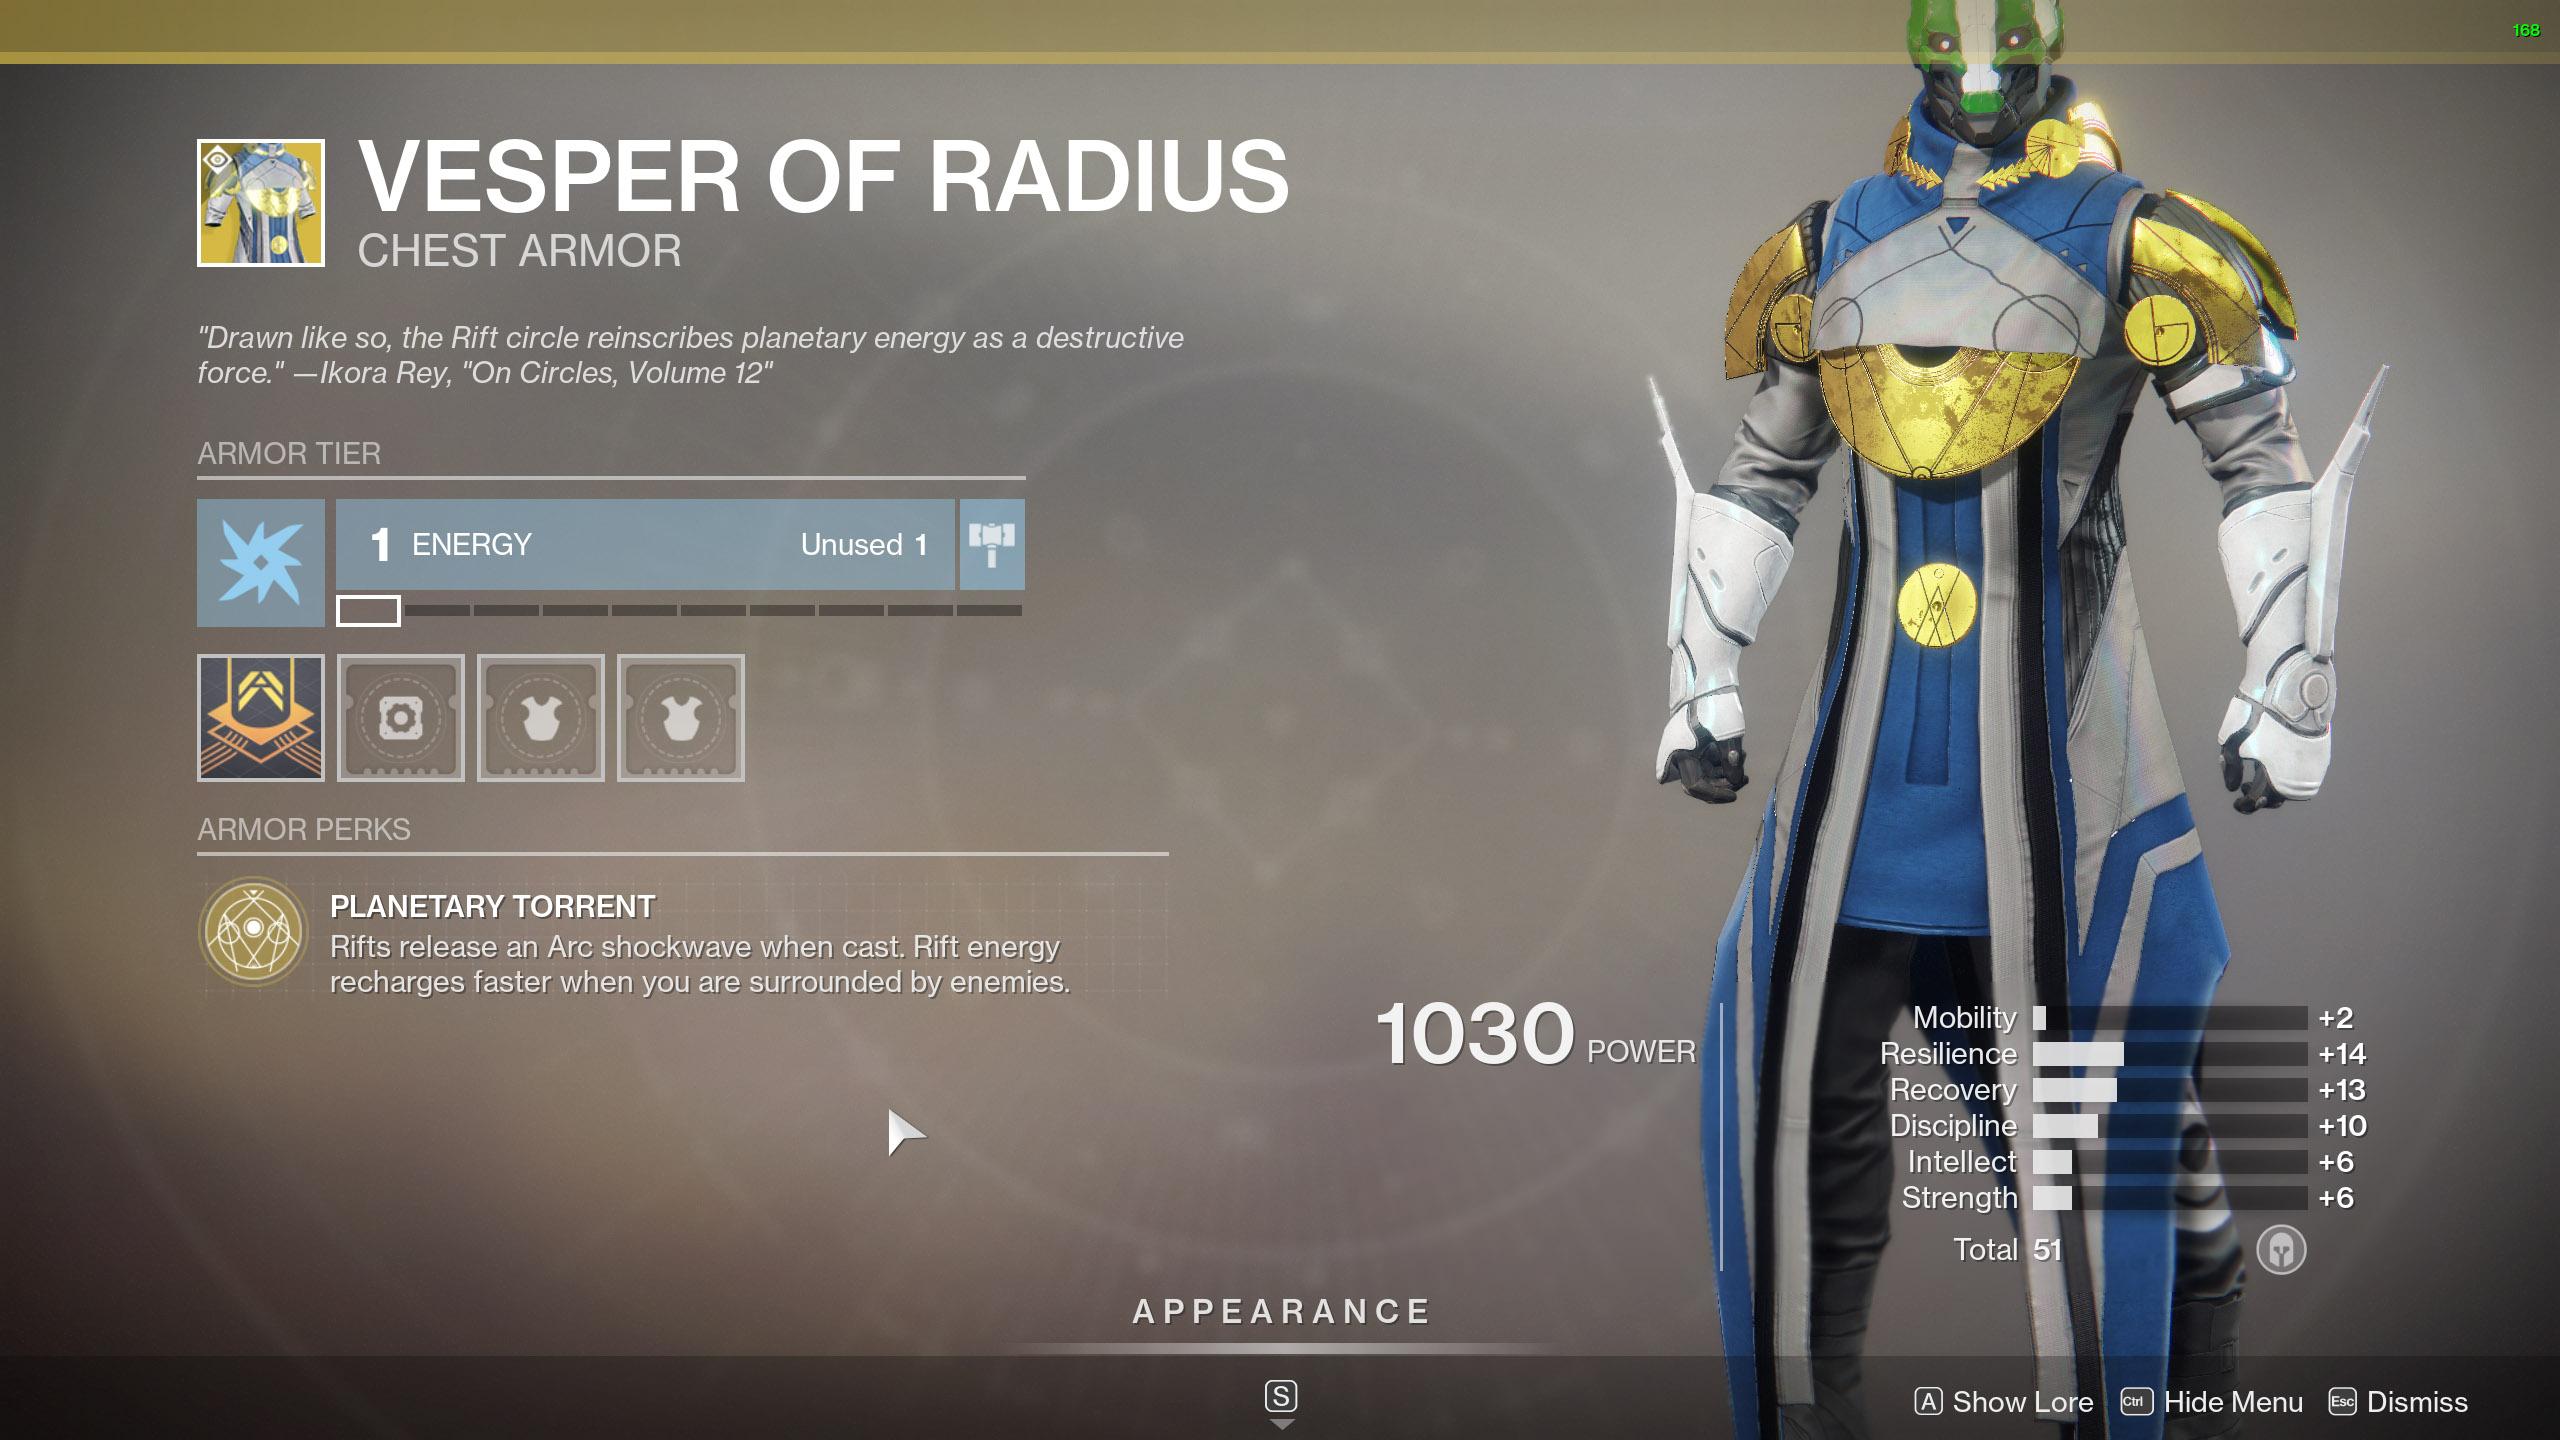 Destiny 2 Exotic Warlock Armor Vesper of Radius